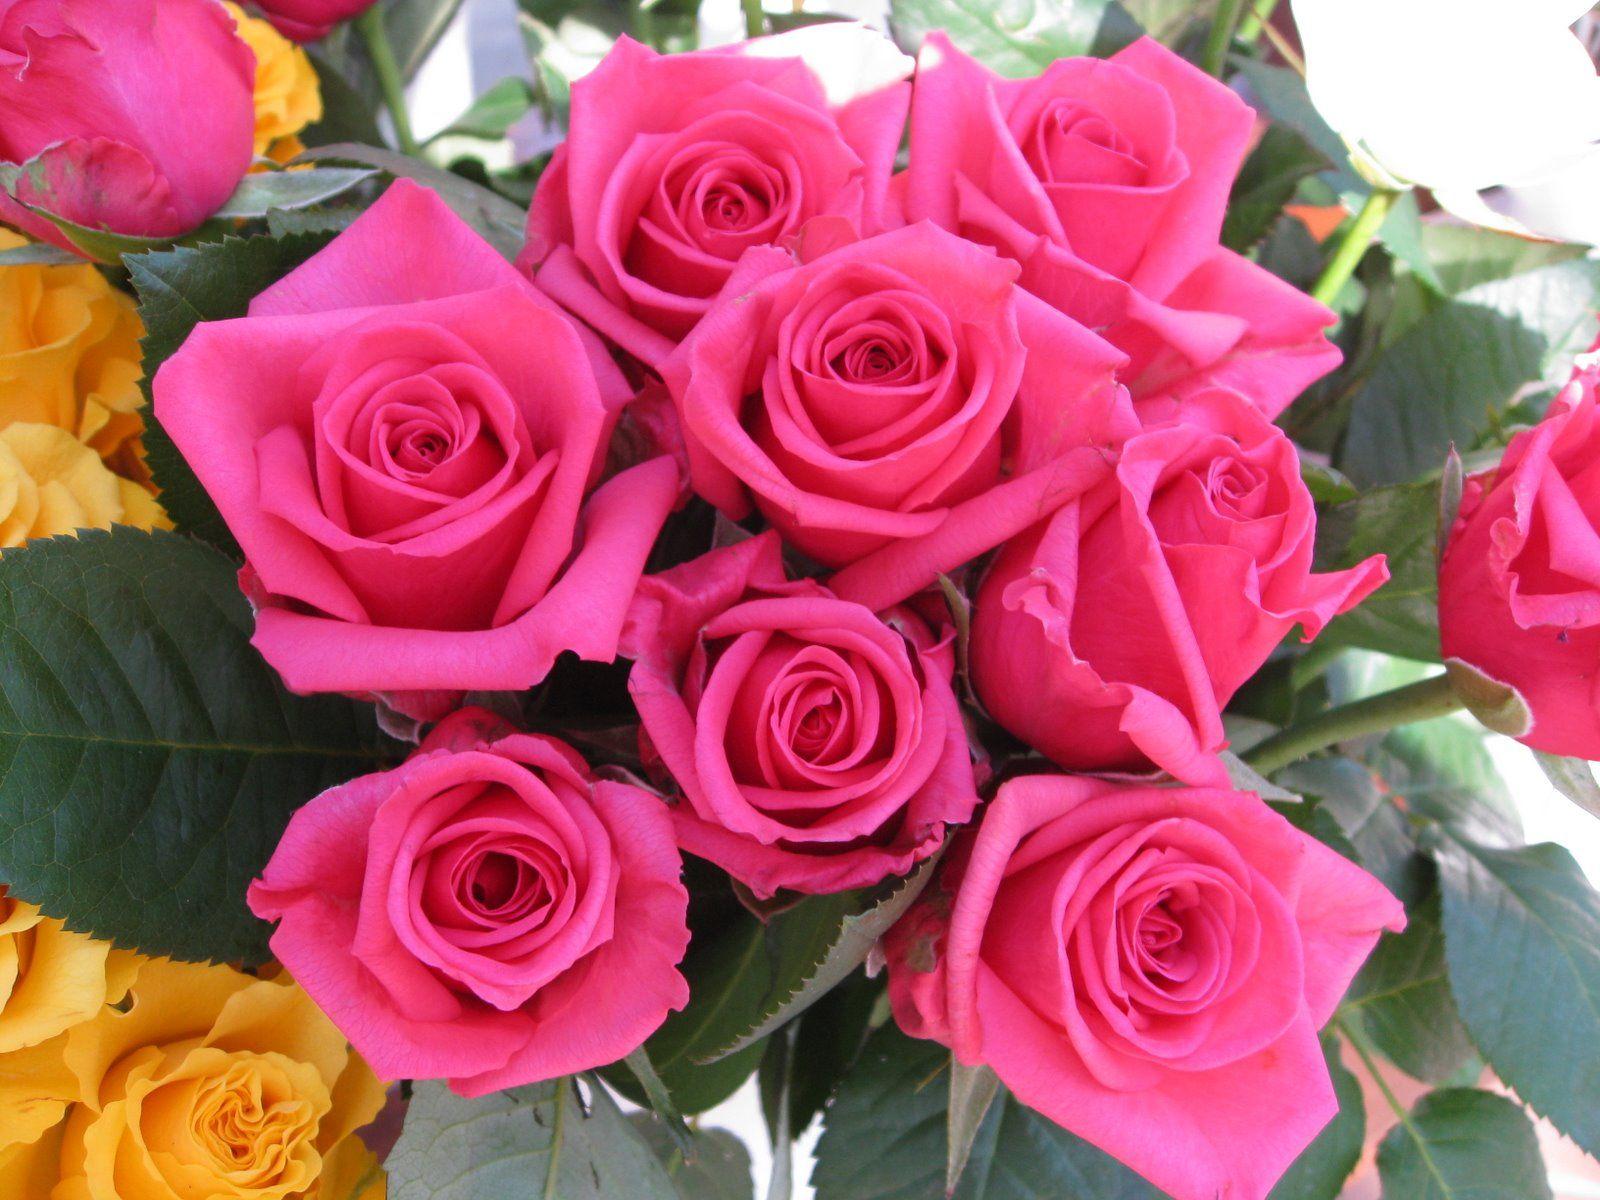 Pink roses rose flower best wallpaper roses pinterest pink pink roses rose flower best wallpaper mightylinksfo Images